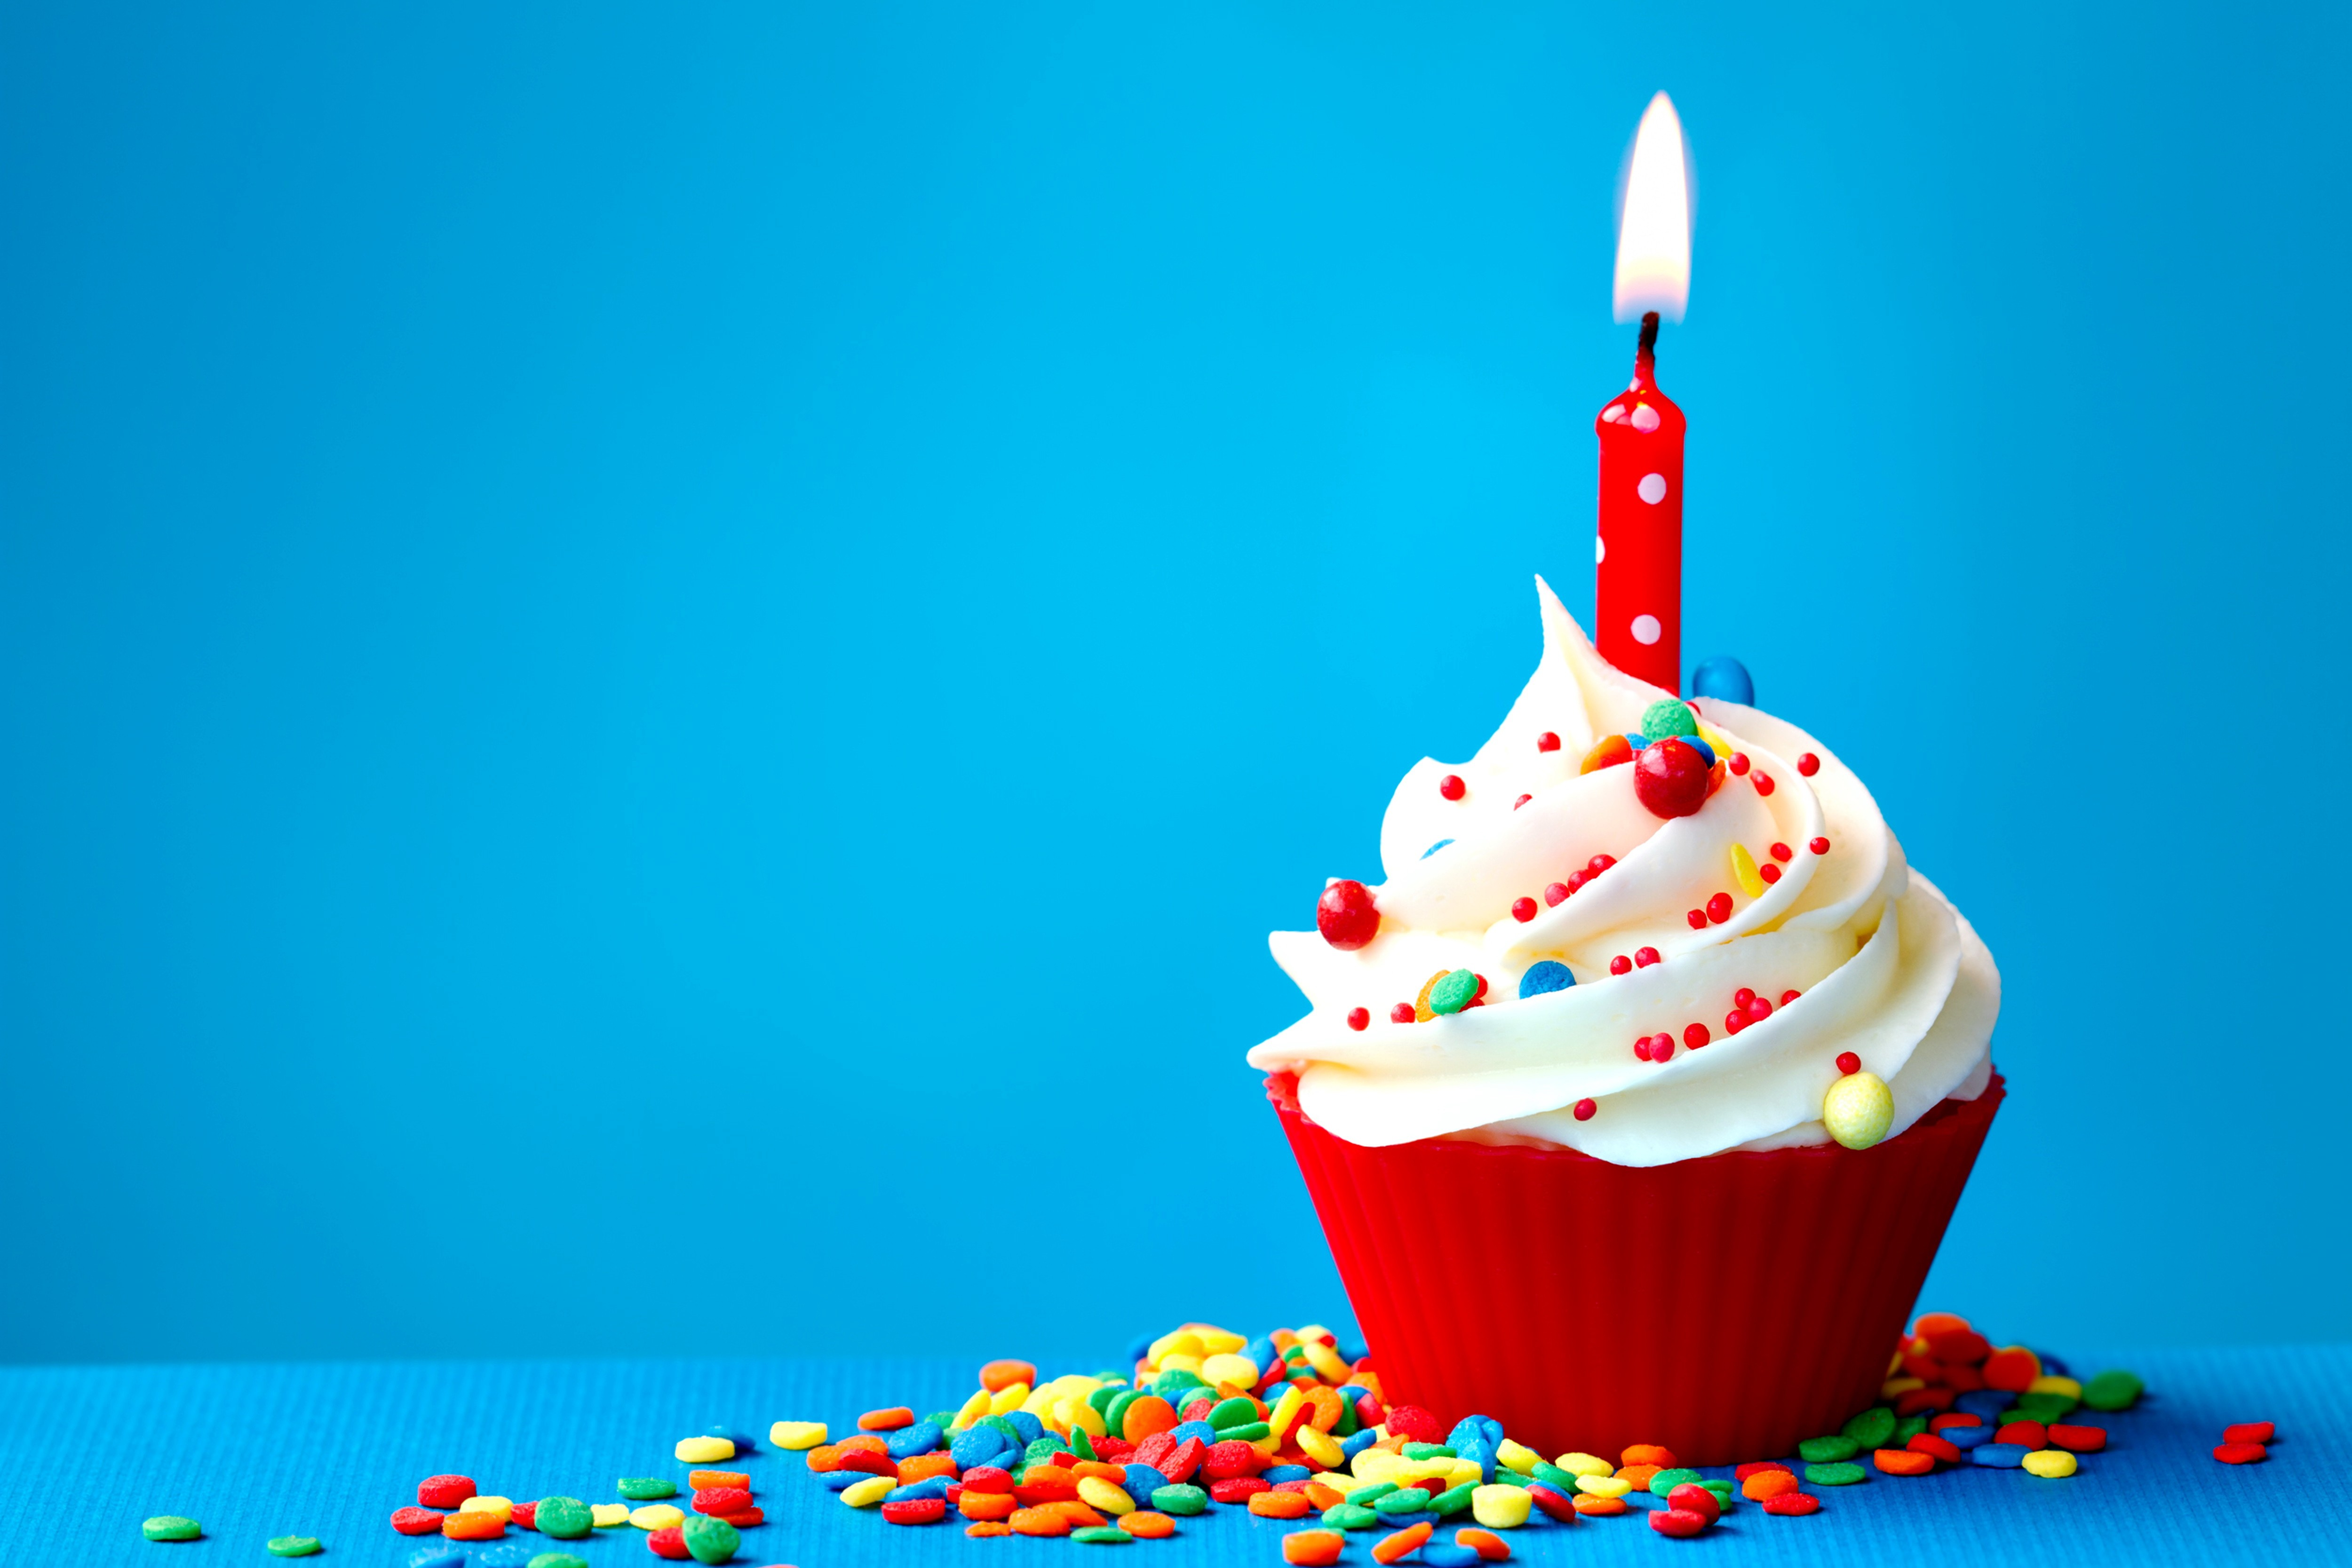 5000x3334 Happy Birthday 04 HD Wallpaper Cake Desktop Background